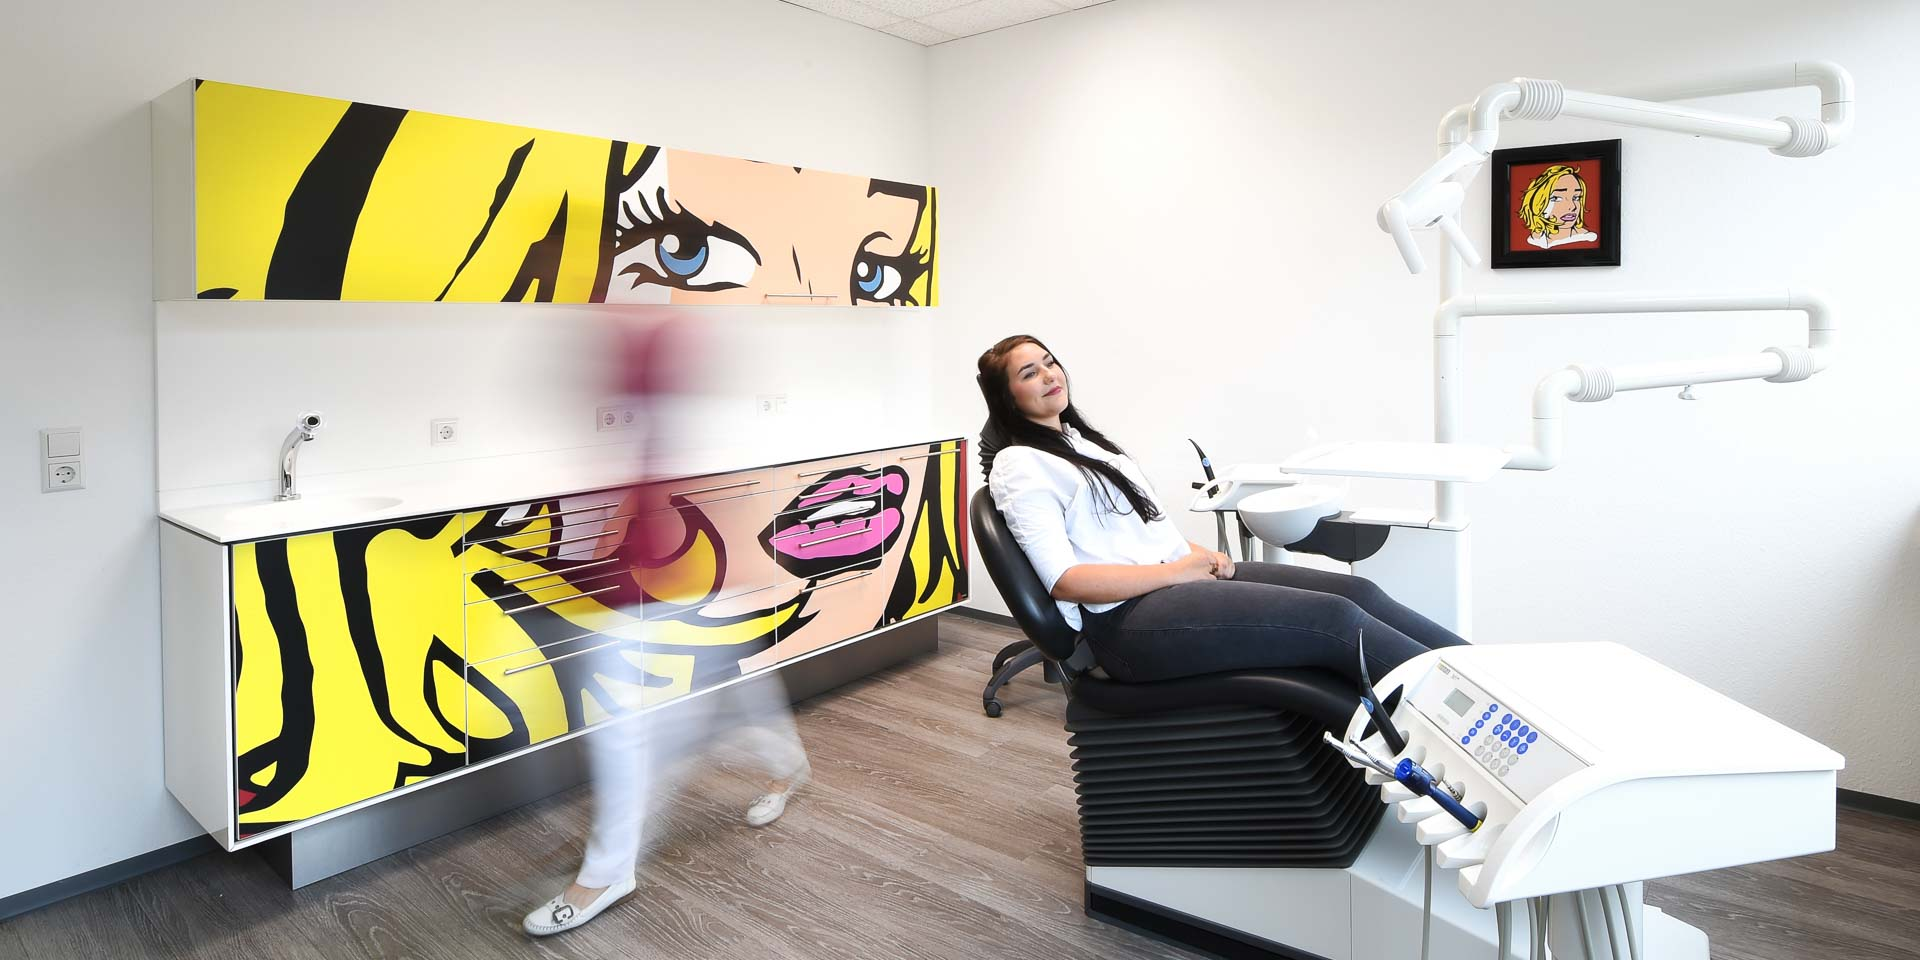 zahnarztpraxis zahnarztpraxis wangen im allg u k wieneke. Black Bedroom Furniture Sets. Home Design Ideas